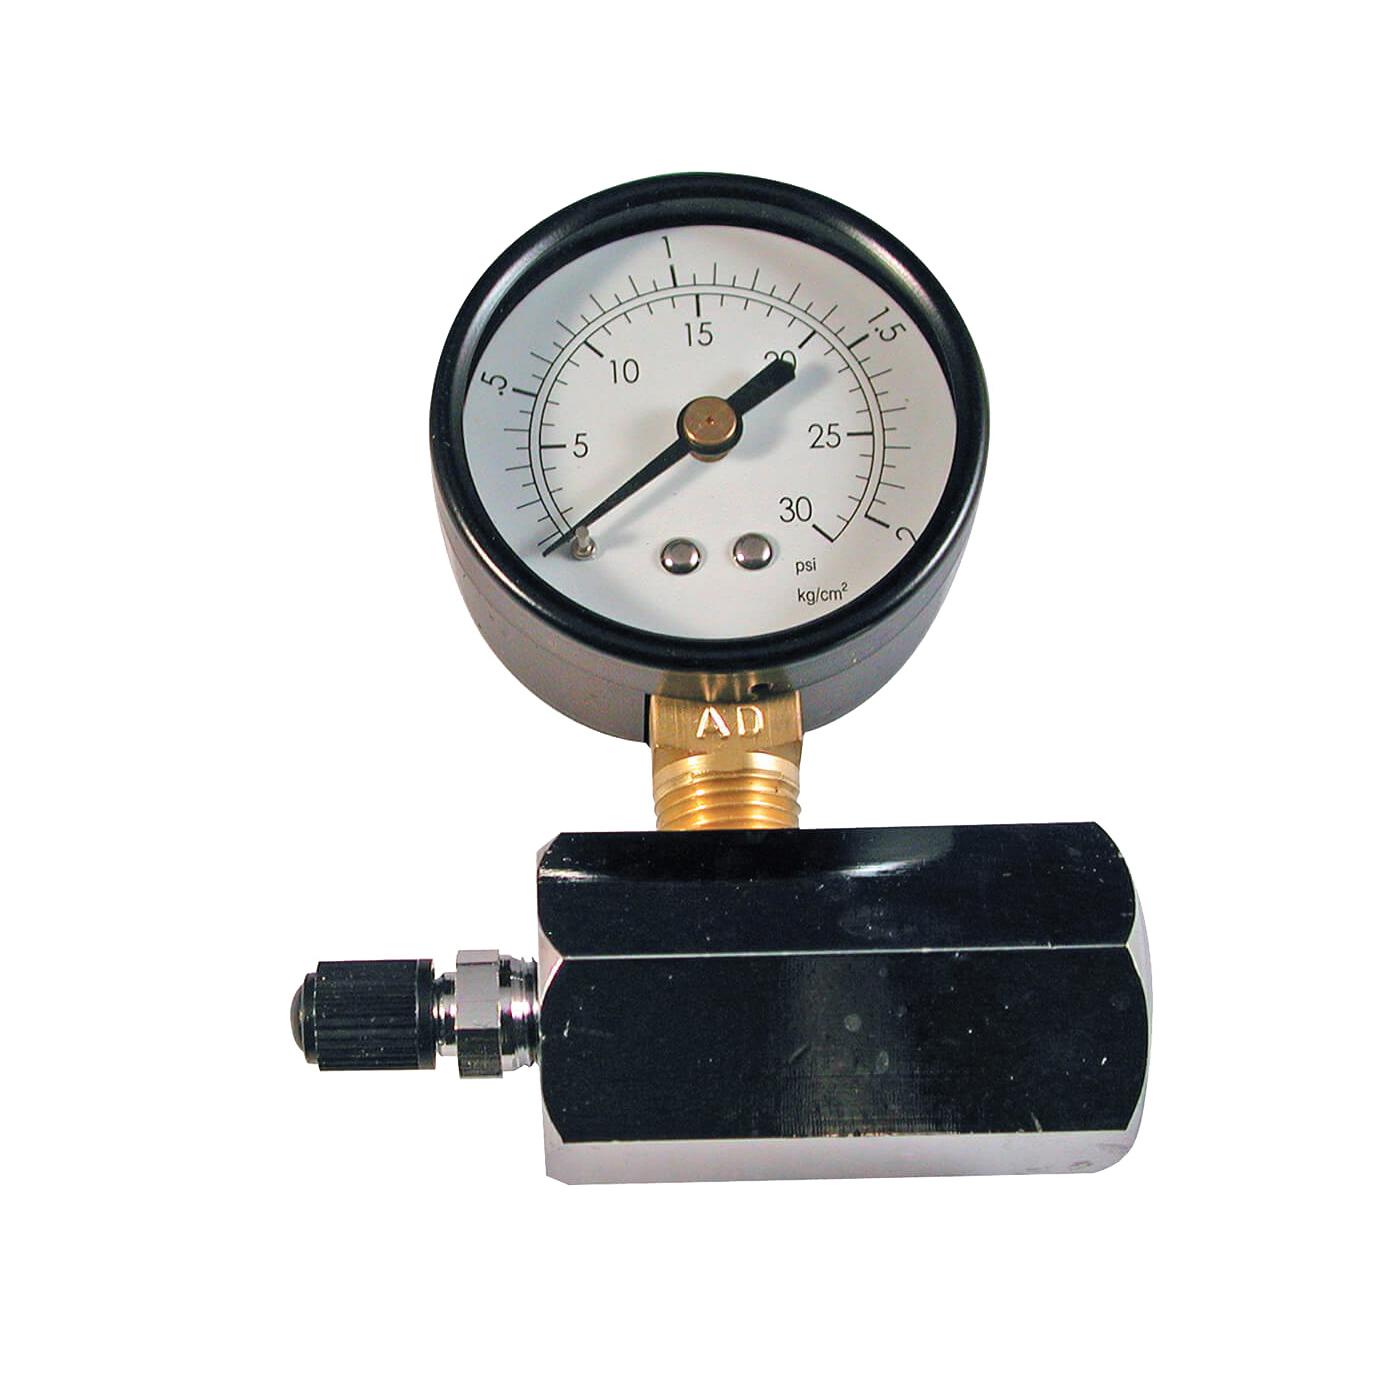 Picture of Danco 61700 Gas Test Gauge, Brass